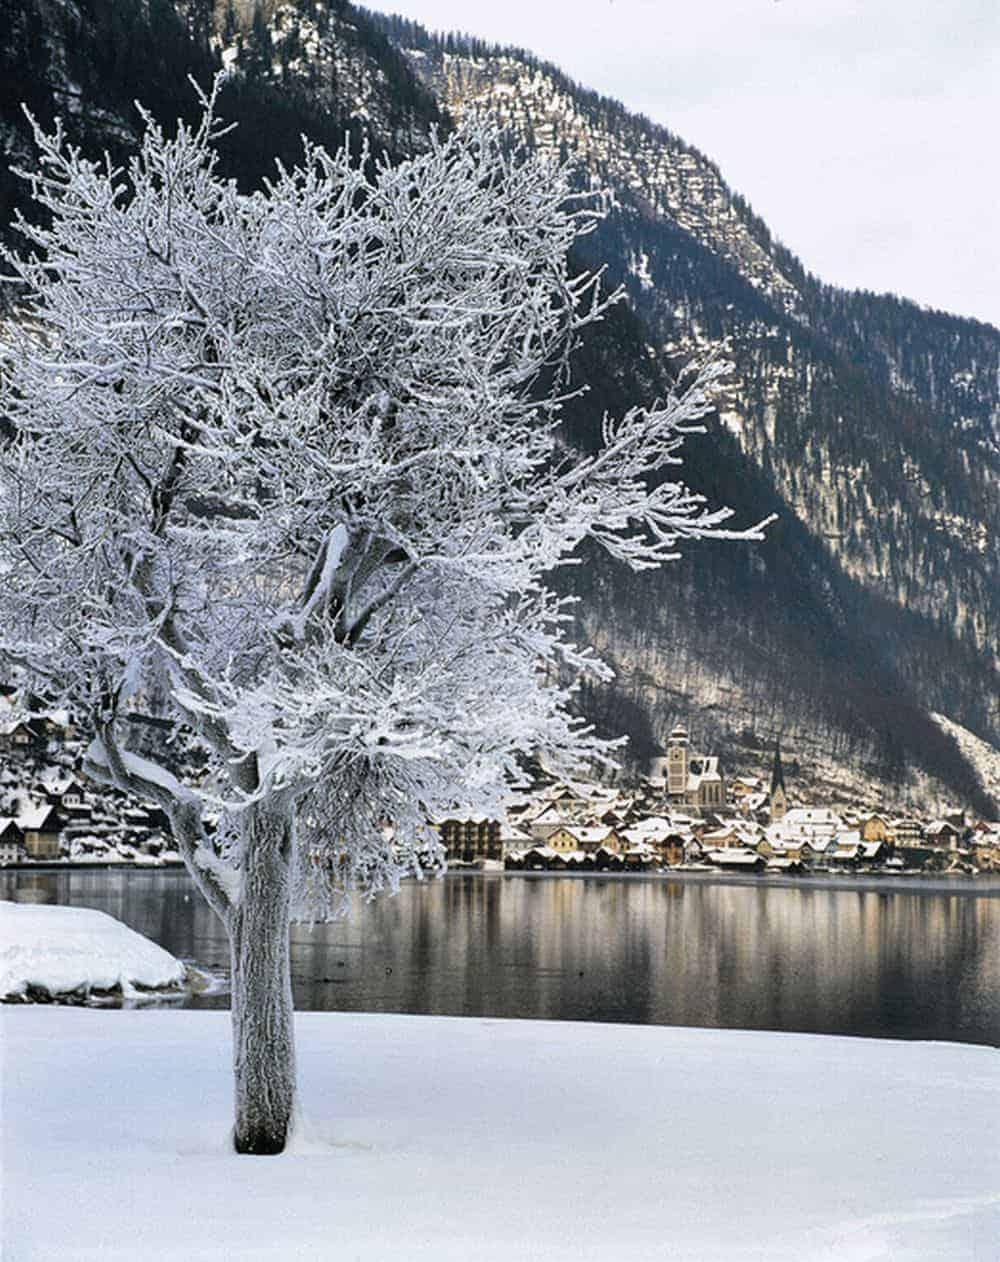 Copac înghețat lângă lacul Hallstatt, Salzkammergut © Österreich Werbung, Foto: Kneidinger